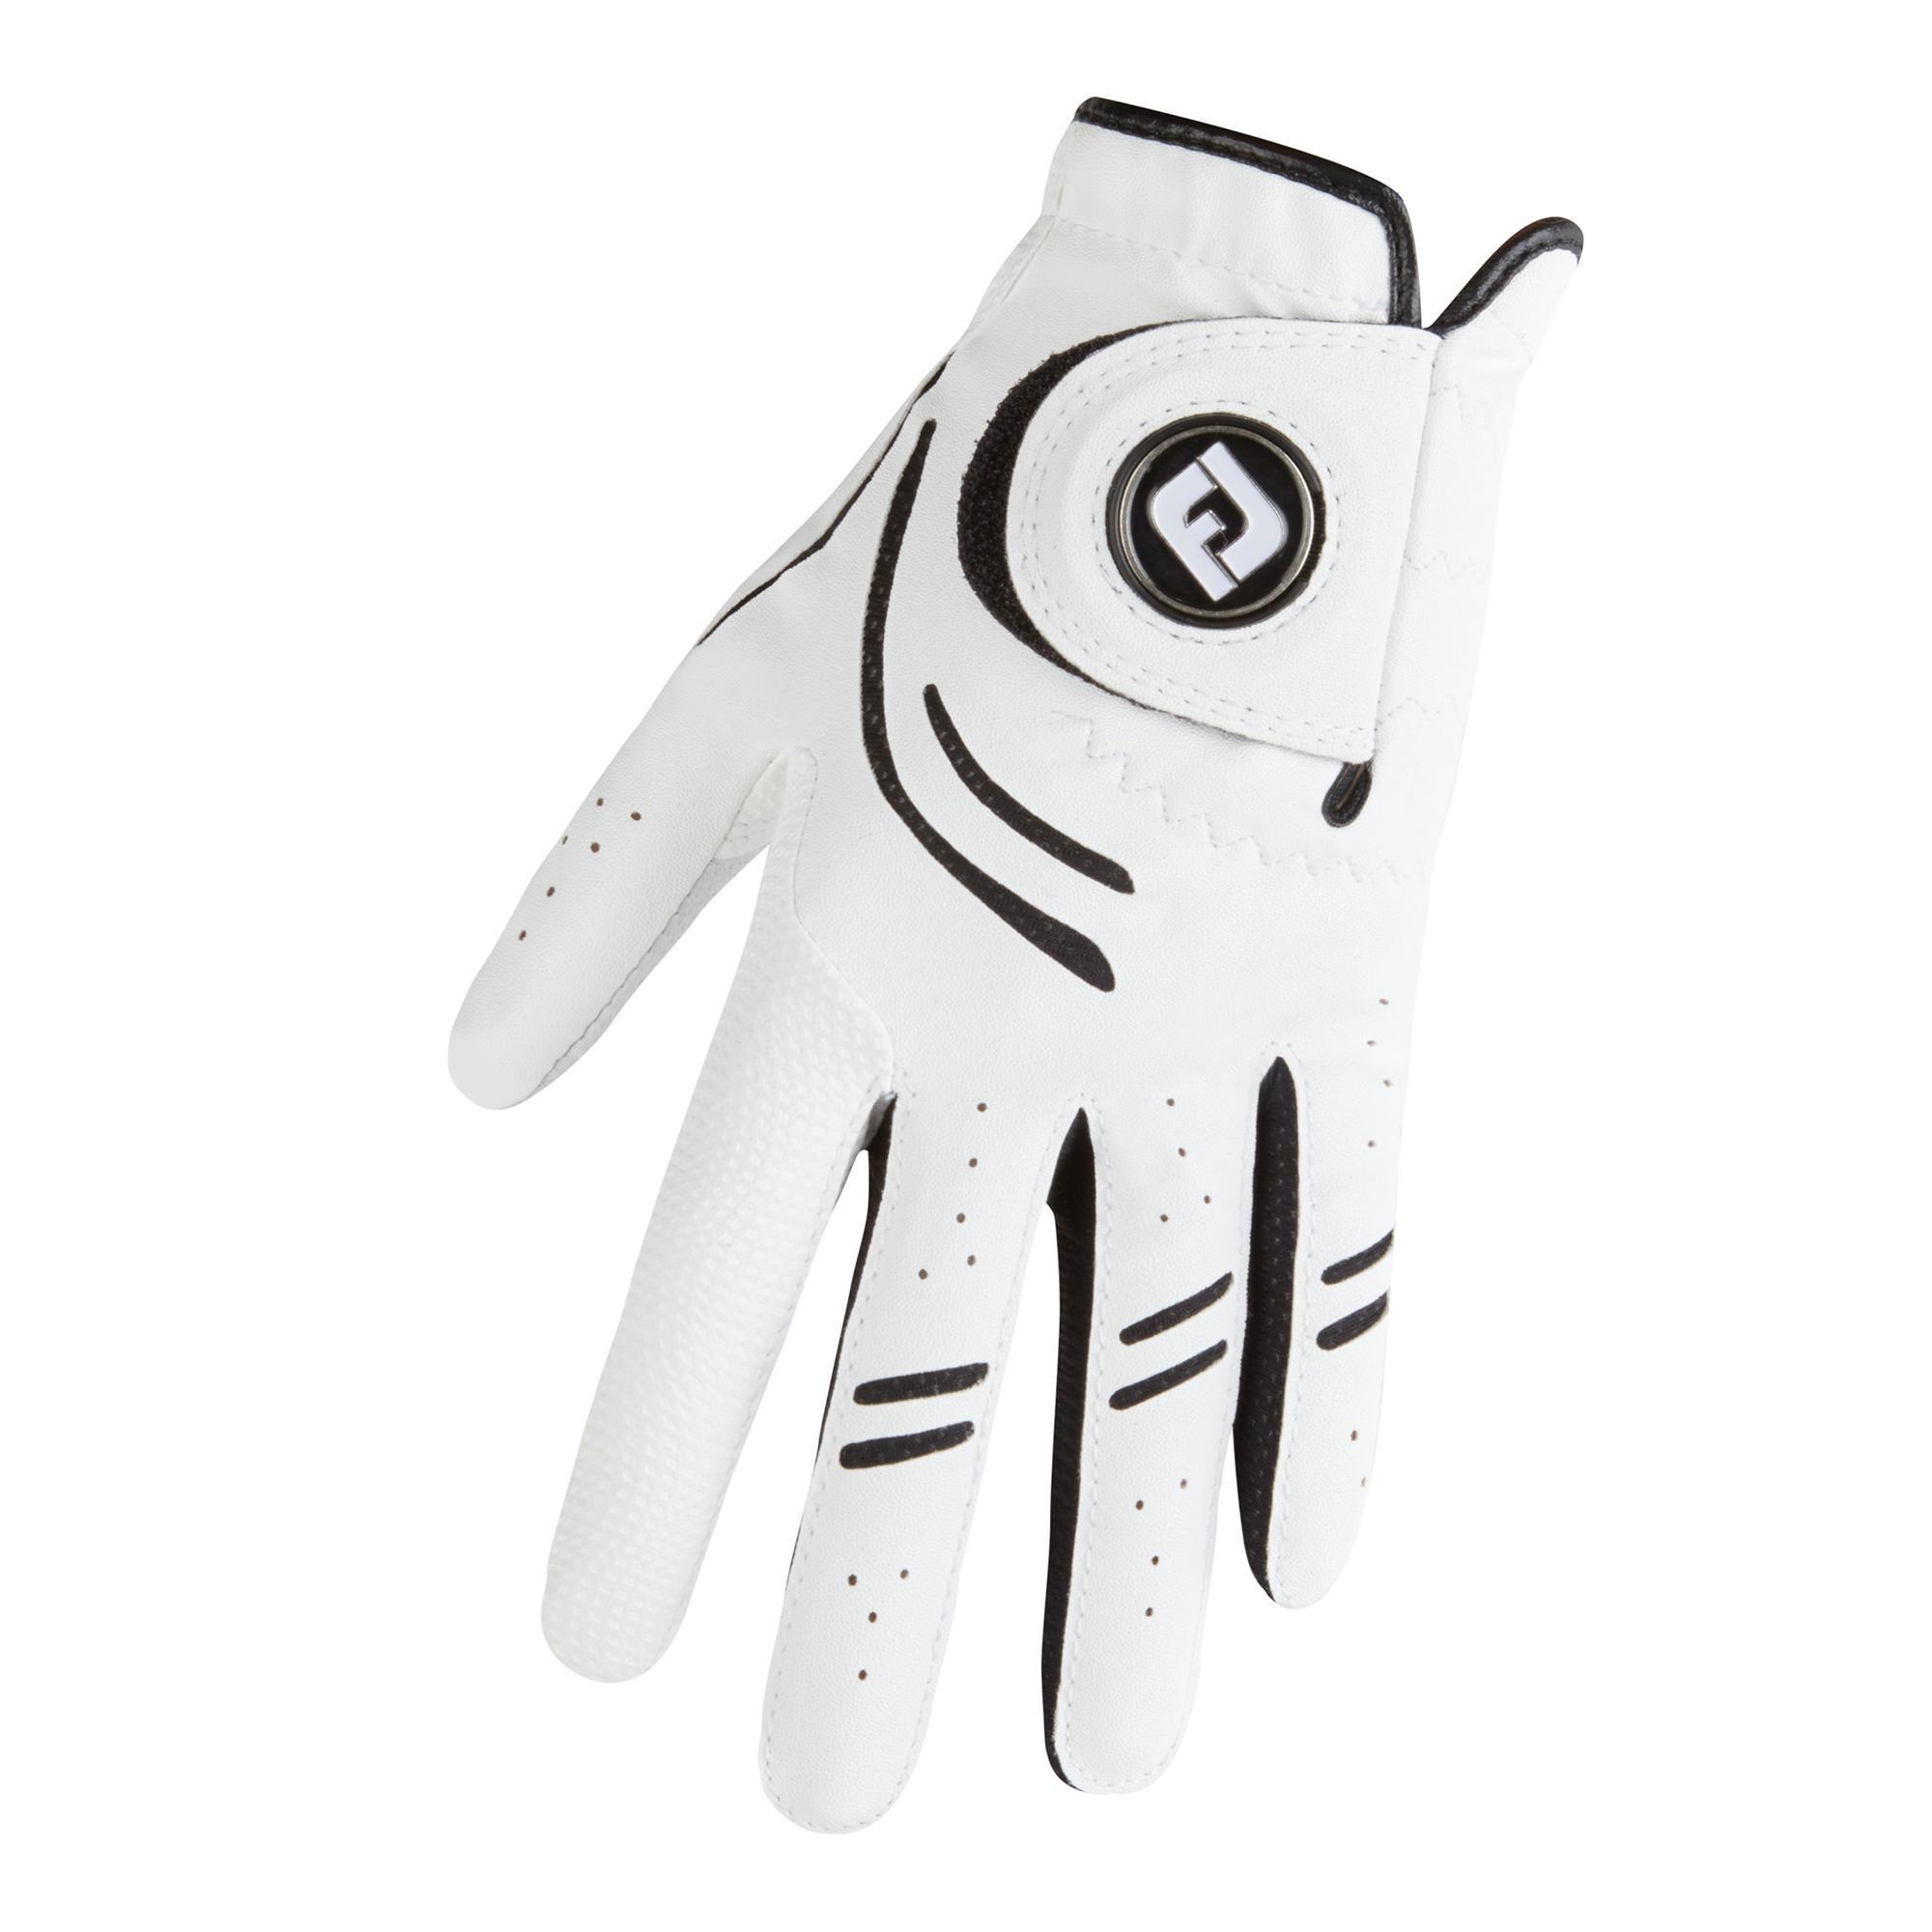 Golfhandschuh GTxtreme Rechtshänder Damen | Accessoires > Handschuhe > Sonstige Handschuhe | FootJoy